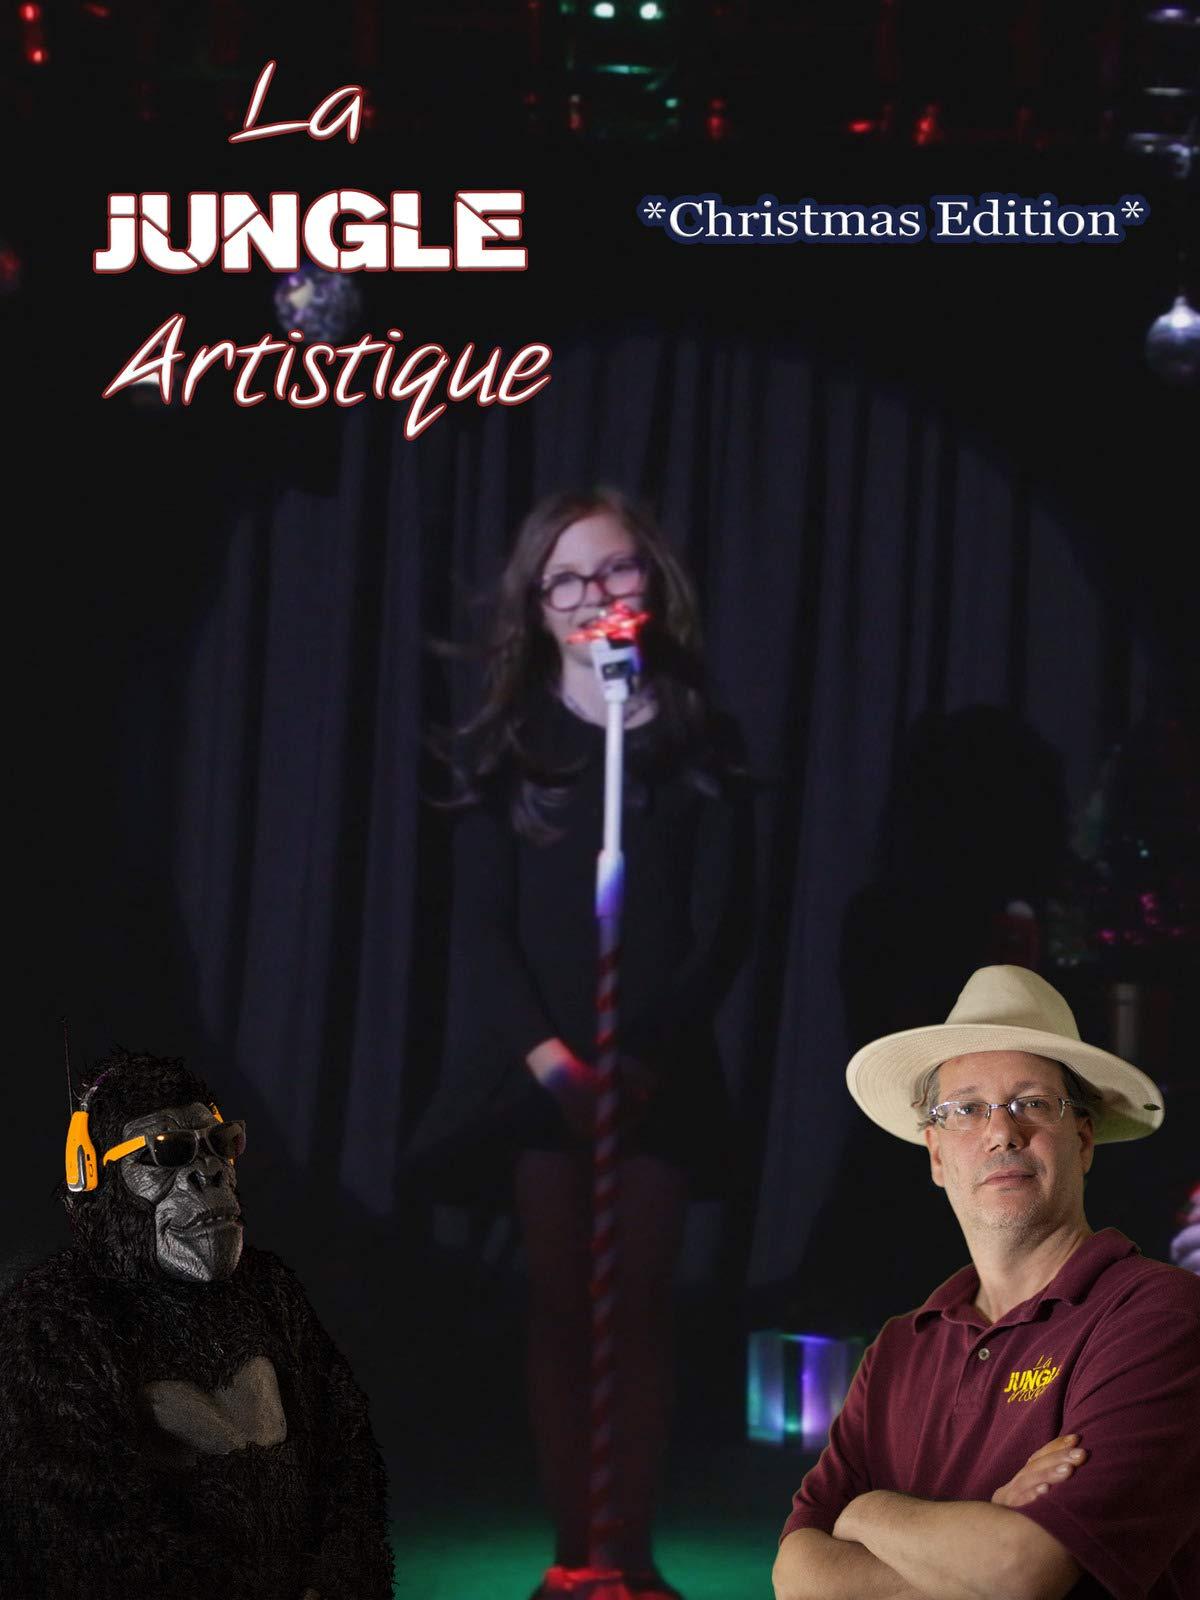 La jungle Artistique Christmas Edition